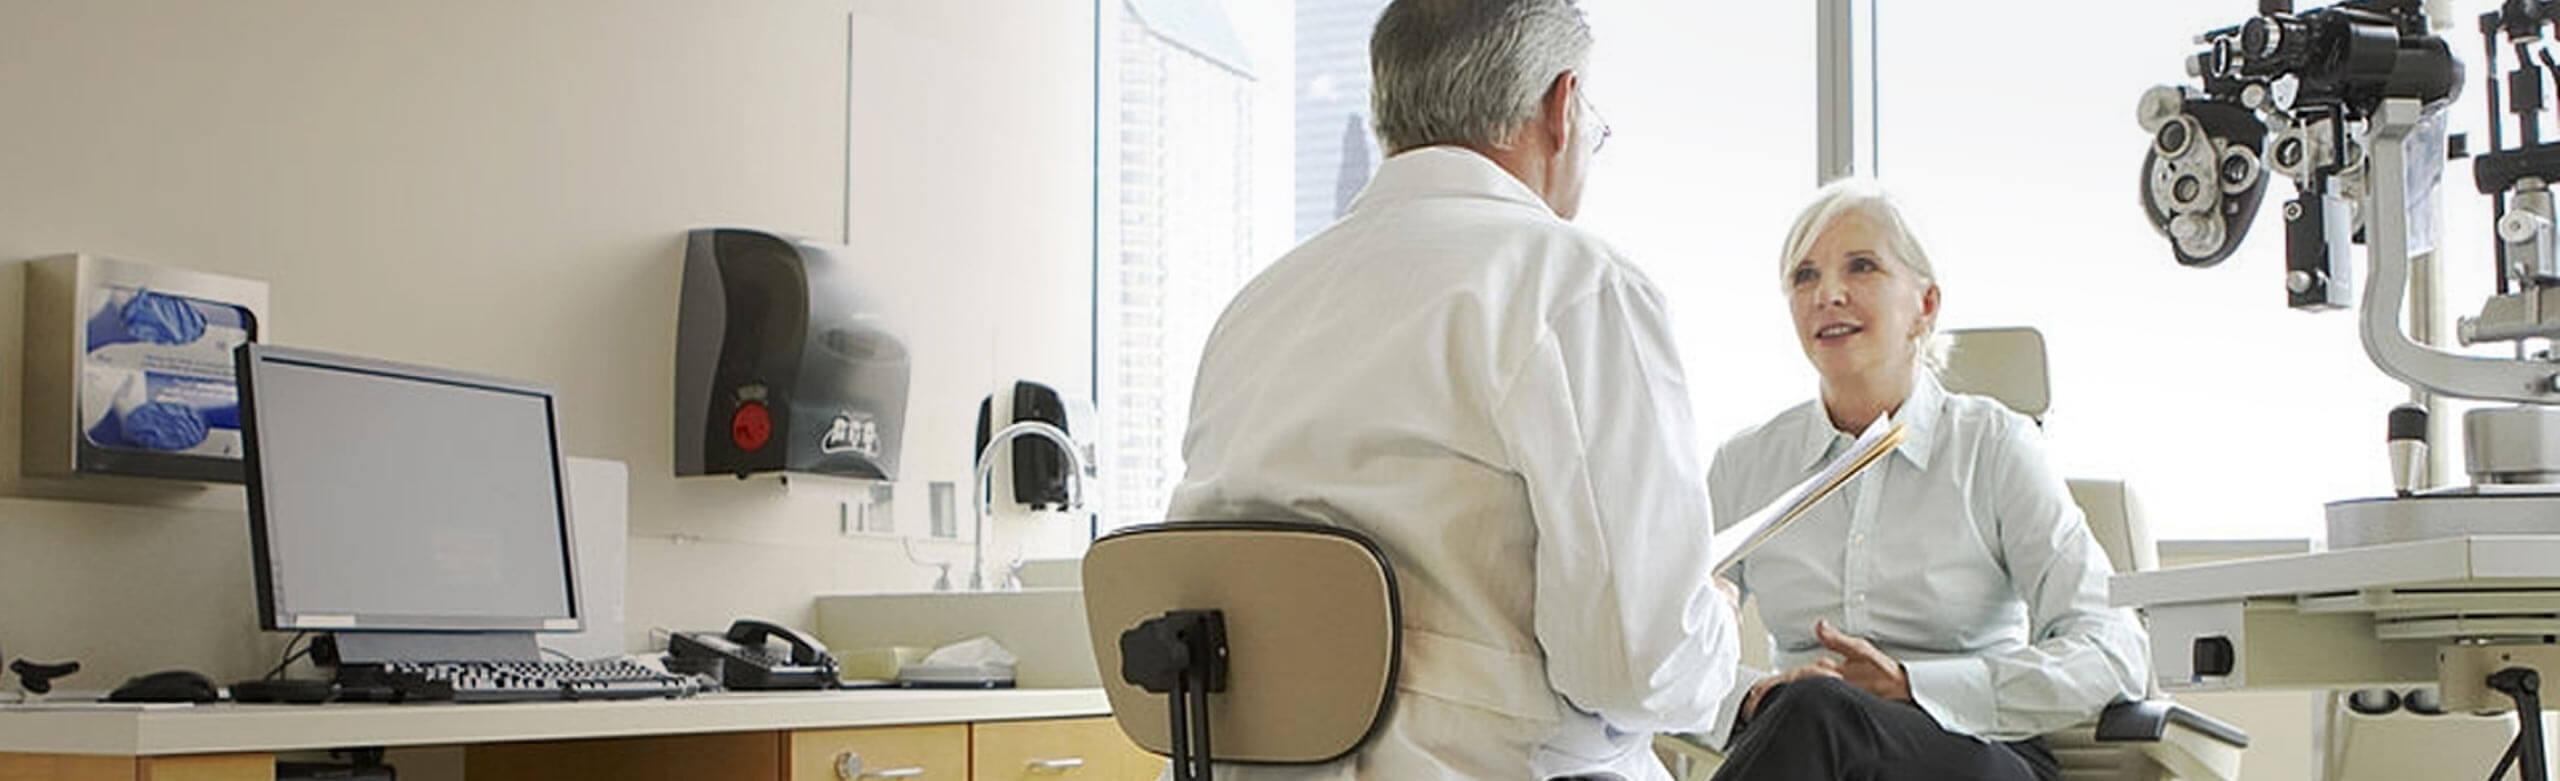 Eye doctor and patient speaking in exam room